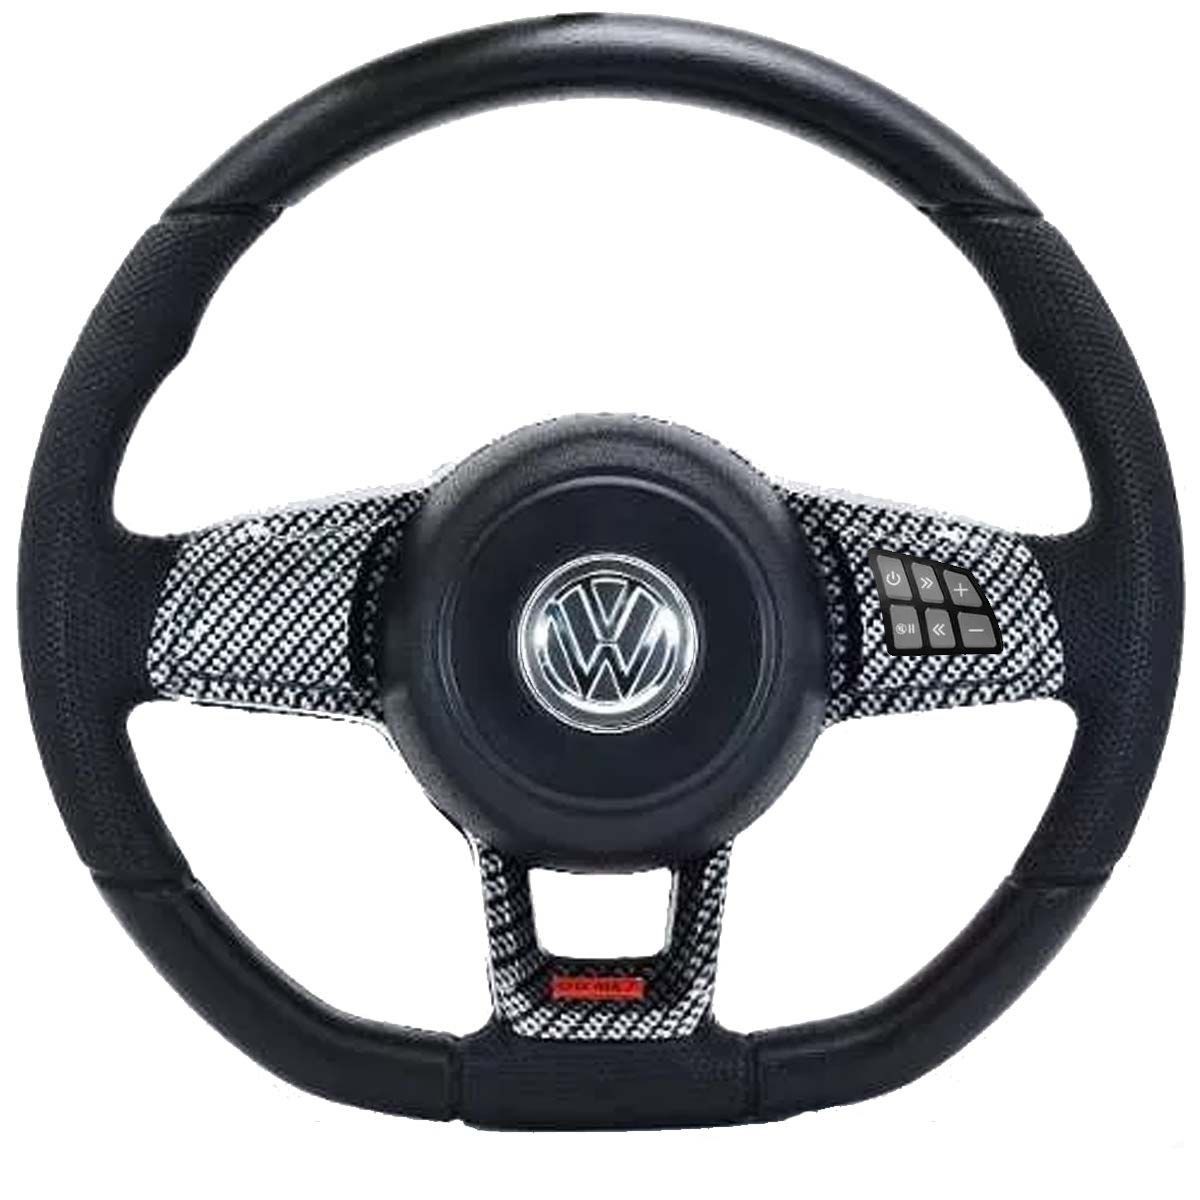 Volante Multifuncional Golf GTI Mk7 Gol Parati Saveiro Voyagen G1 G2 G3 G4 G5 Golf Fusca Brasilia Polo Kombi Santana Passat Volkswagen + Cubo Vw